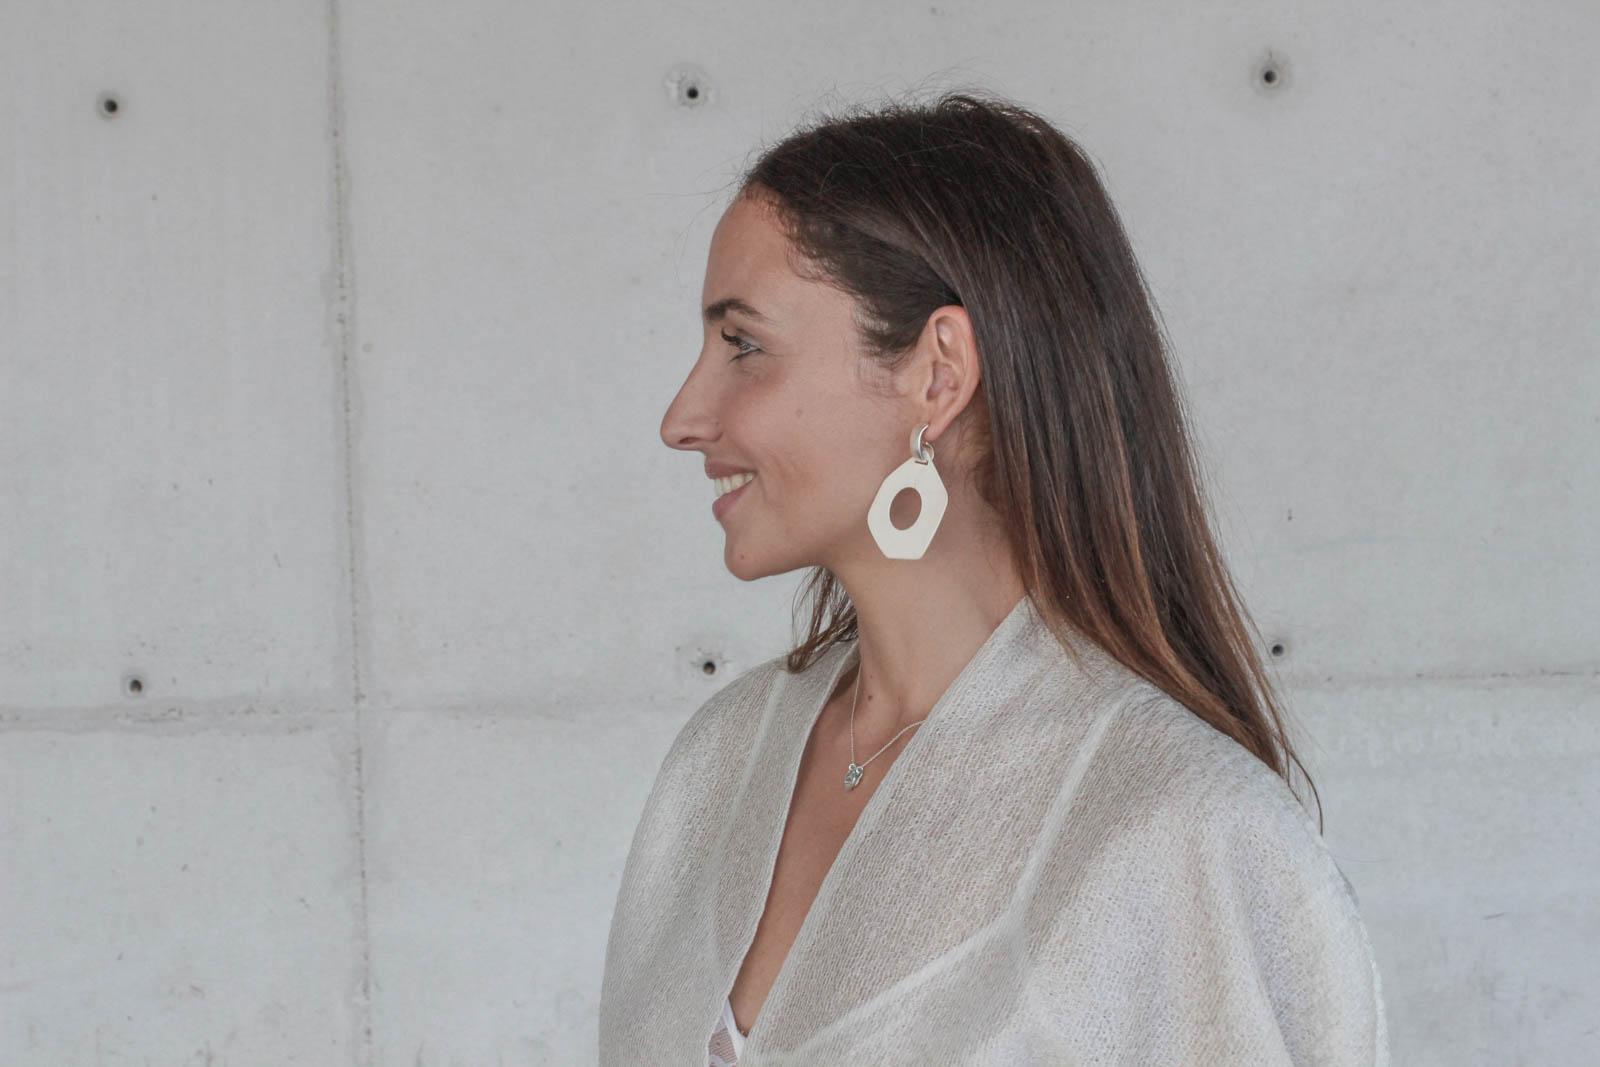 el-blog-de-silvia-rodriguez-Streetstyle-Blogger-MBFWMadrid-devota-y-lomba-pantalon-rayas-rojas-blog-de-moda-Influencer